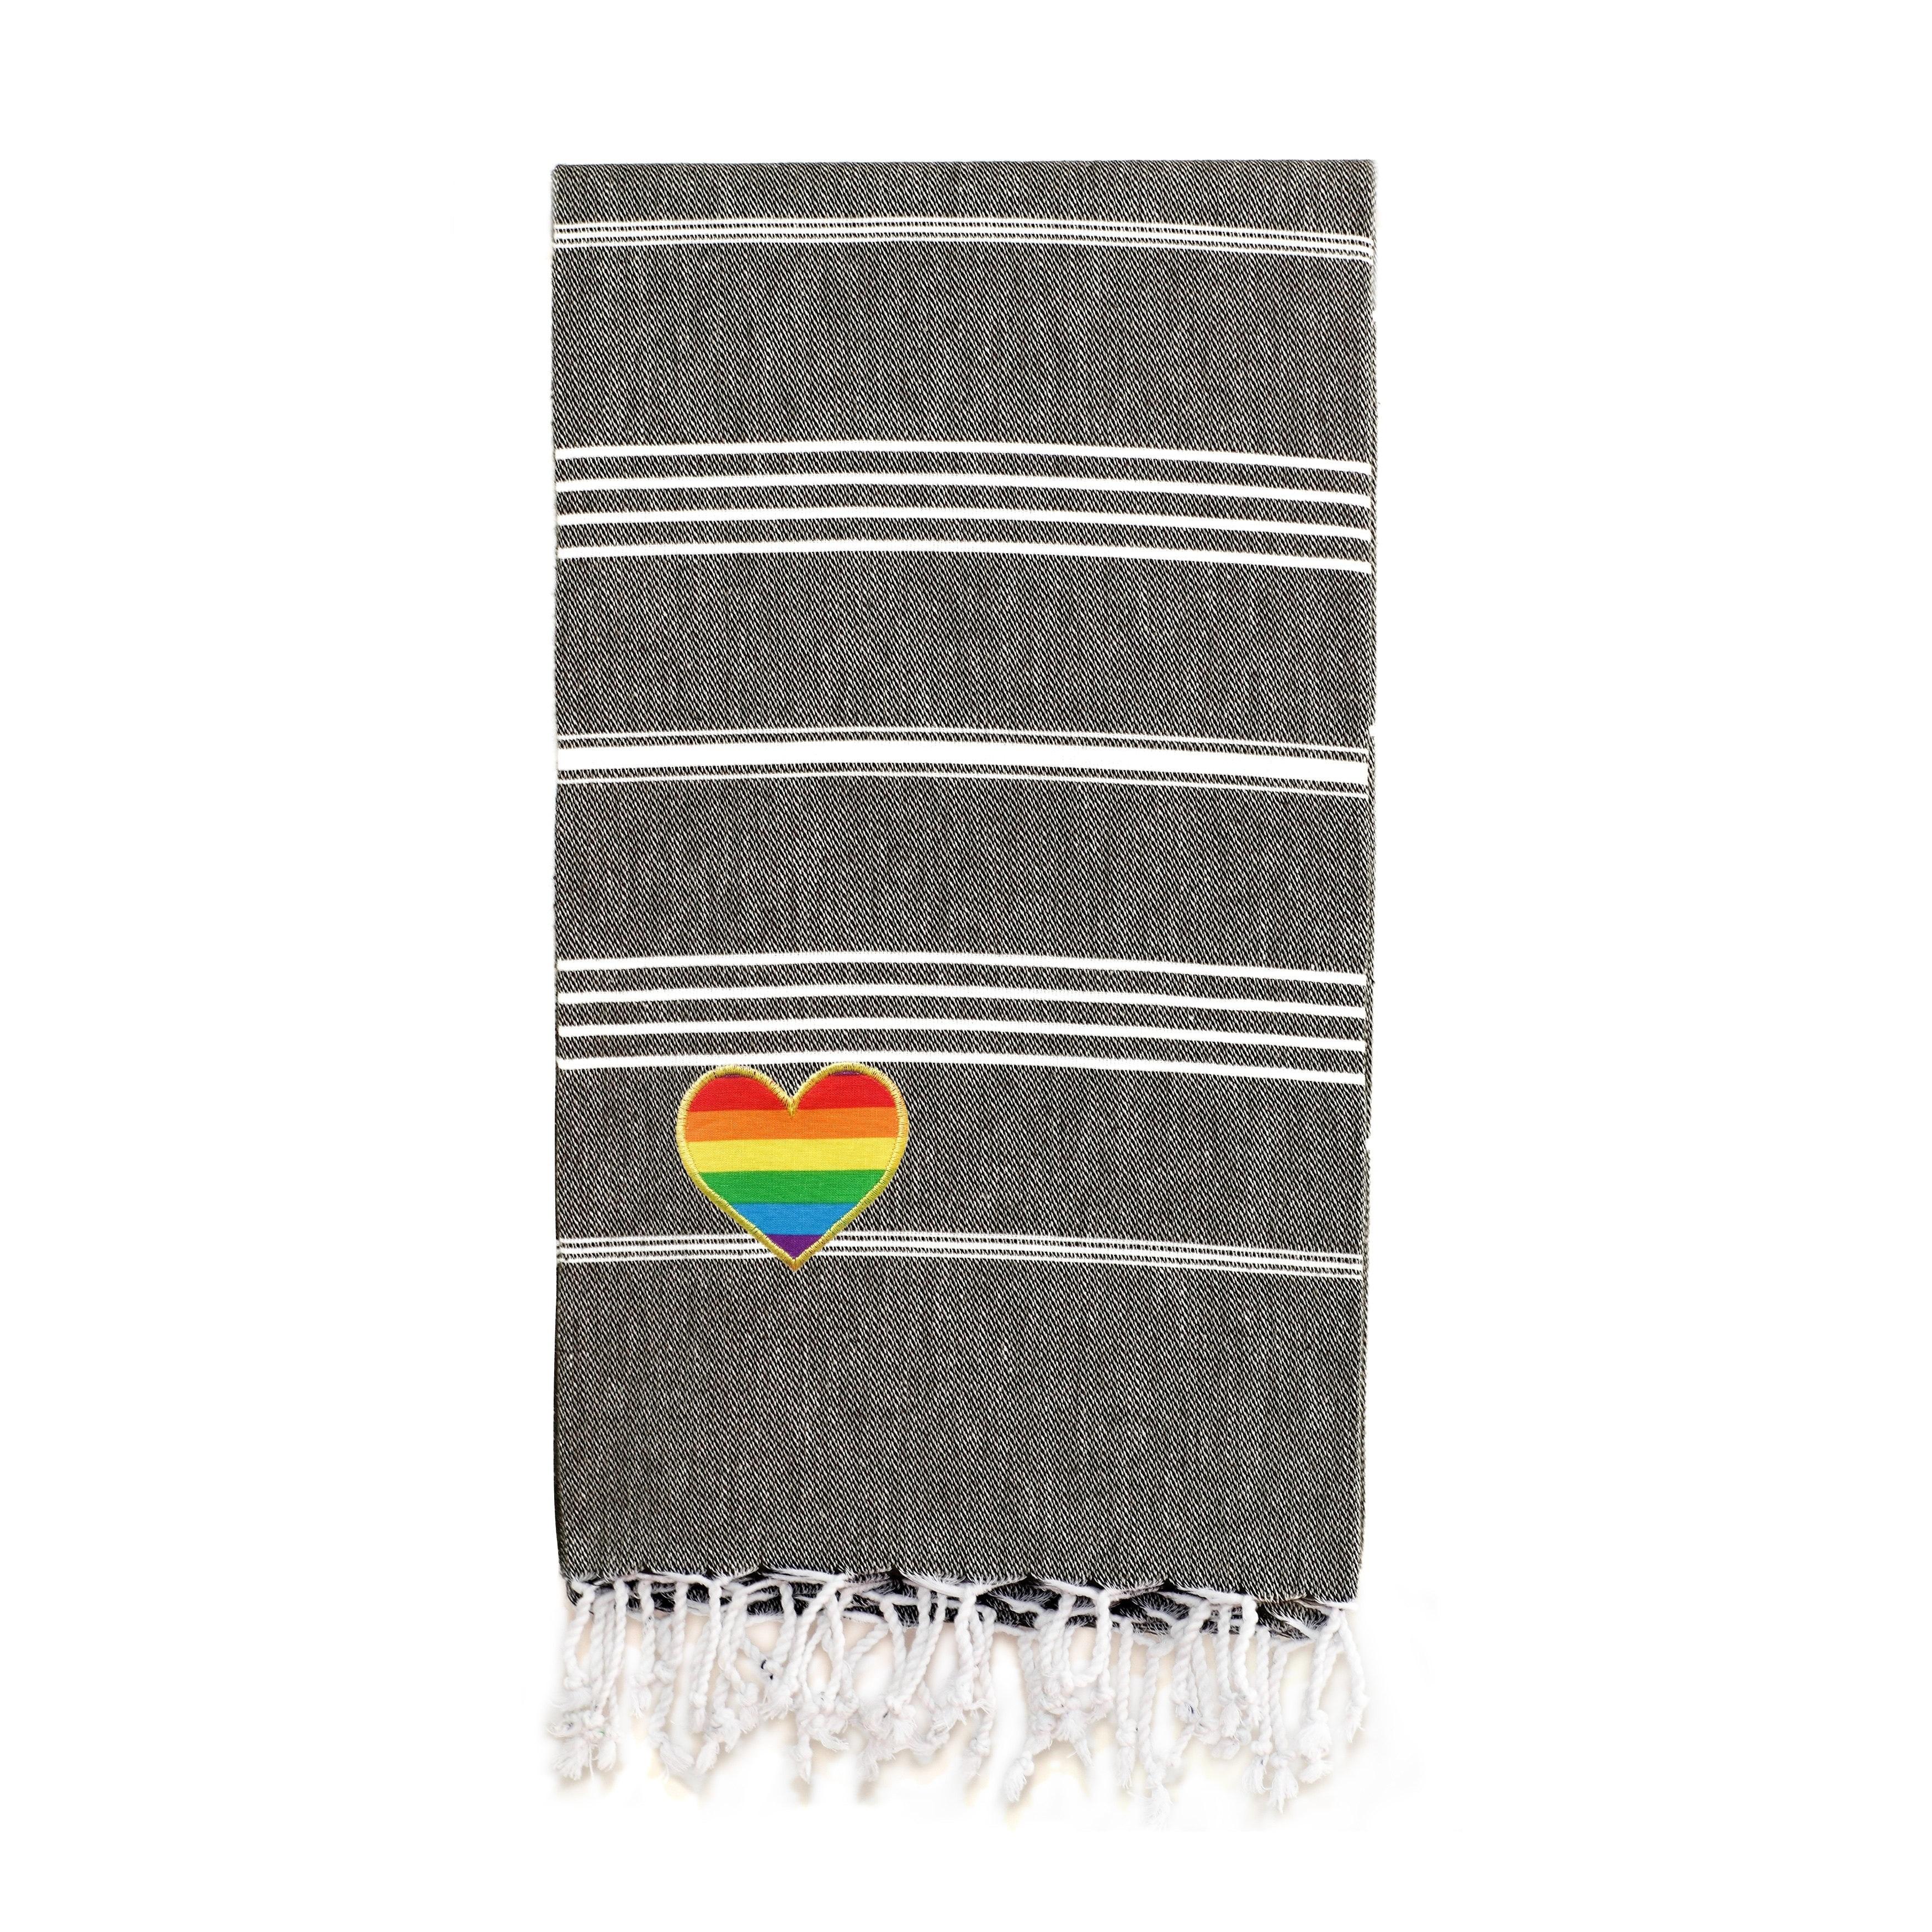 Authentic Hotel And Spa 100 Turkish Cotton Lucky Cheerful Rainbow Heart Pestemal Beach Towel Overstock 28737882